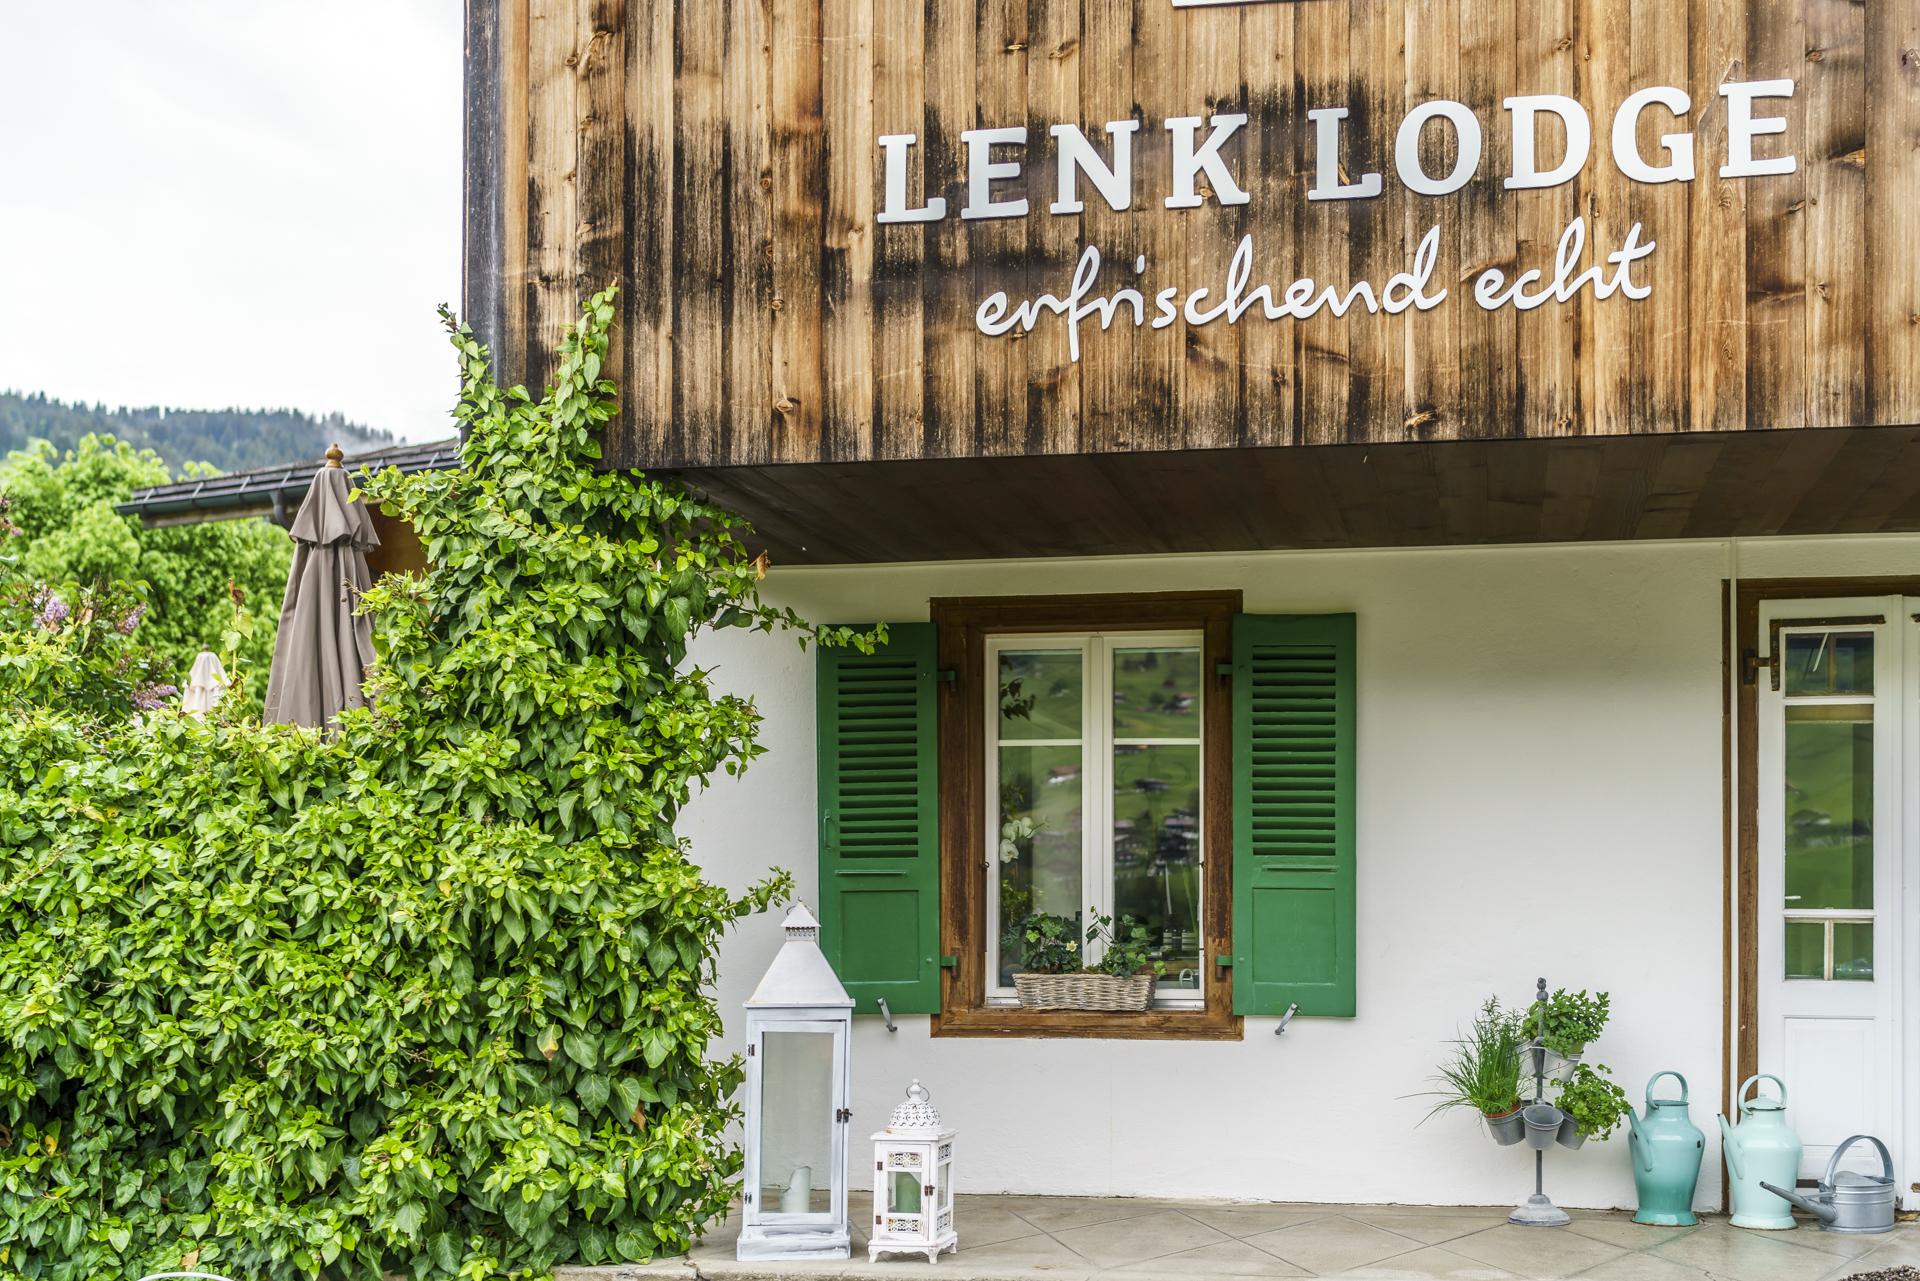 Lenk-Lodge-einfach-anders